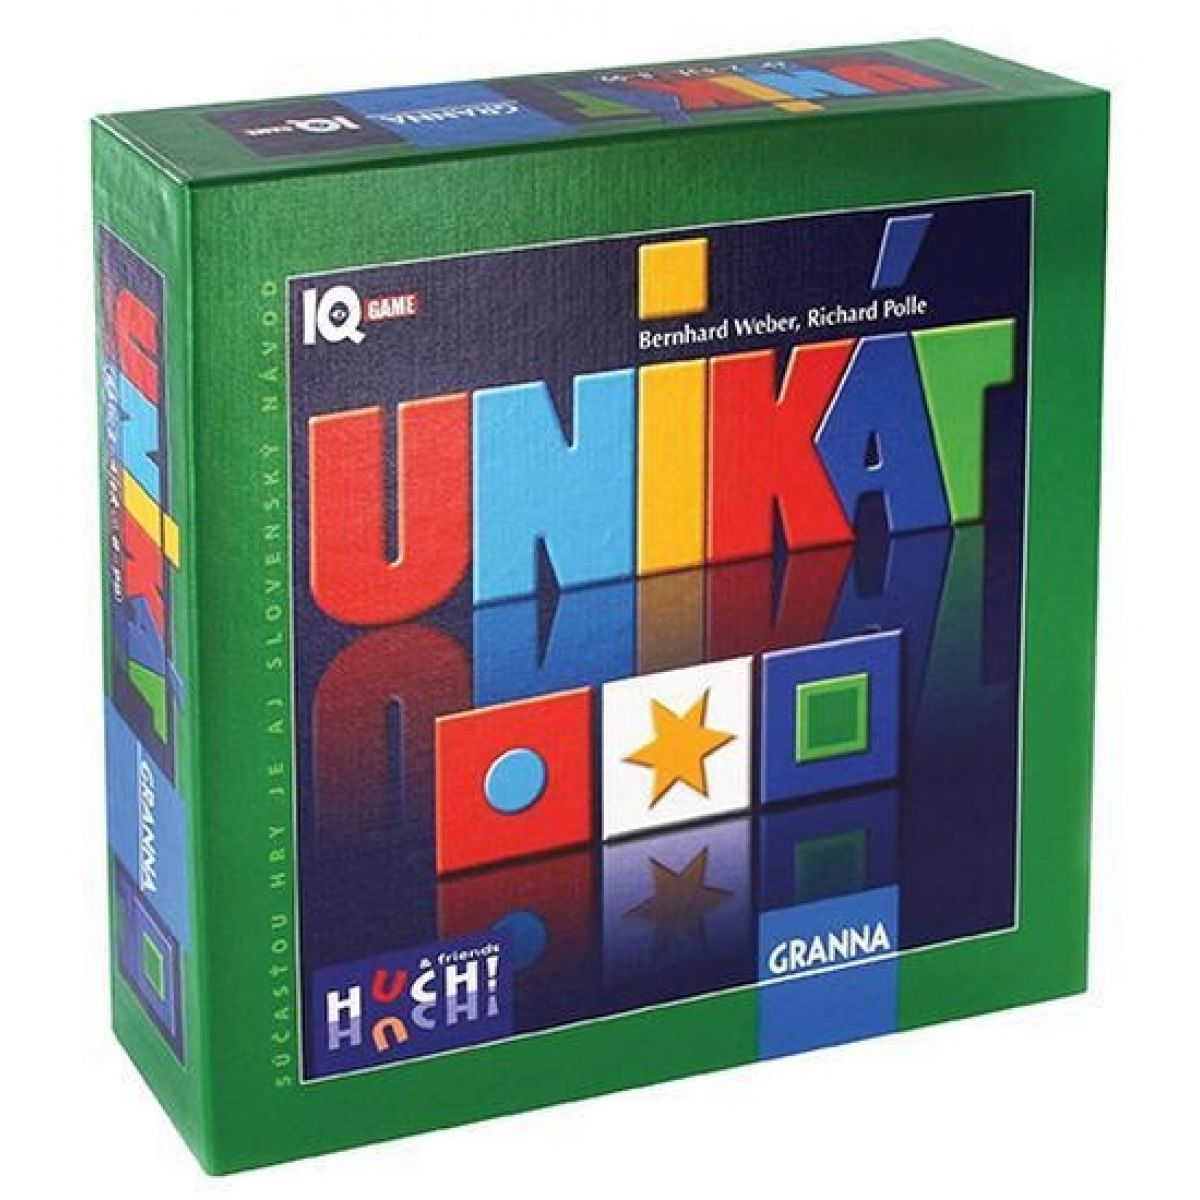 Granna Hra Unikát